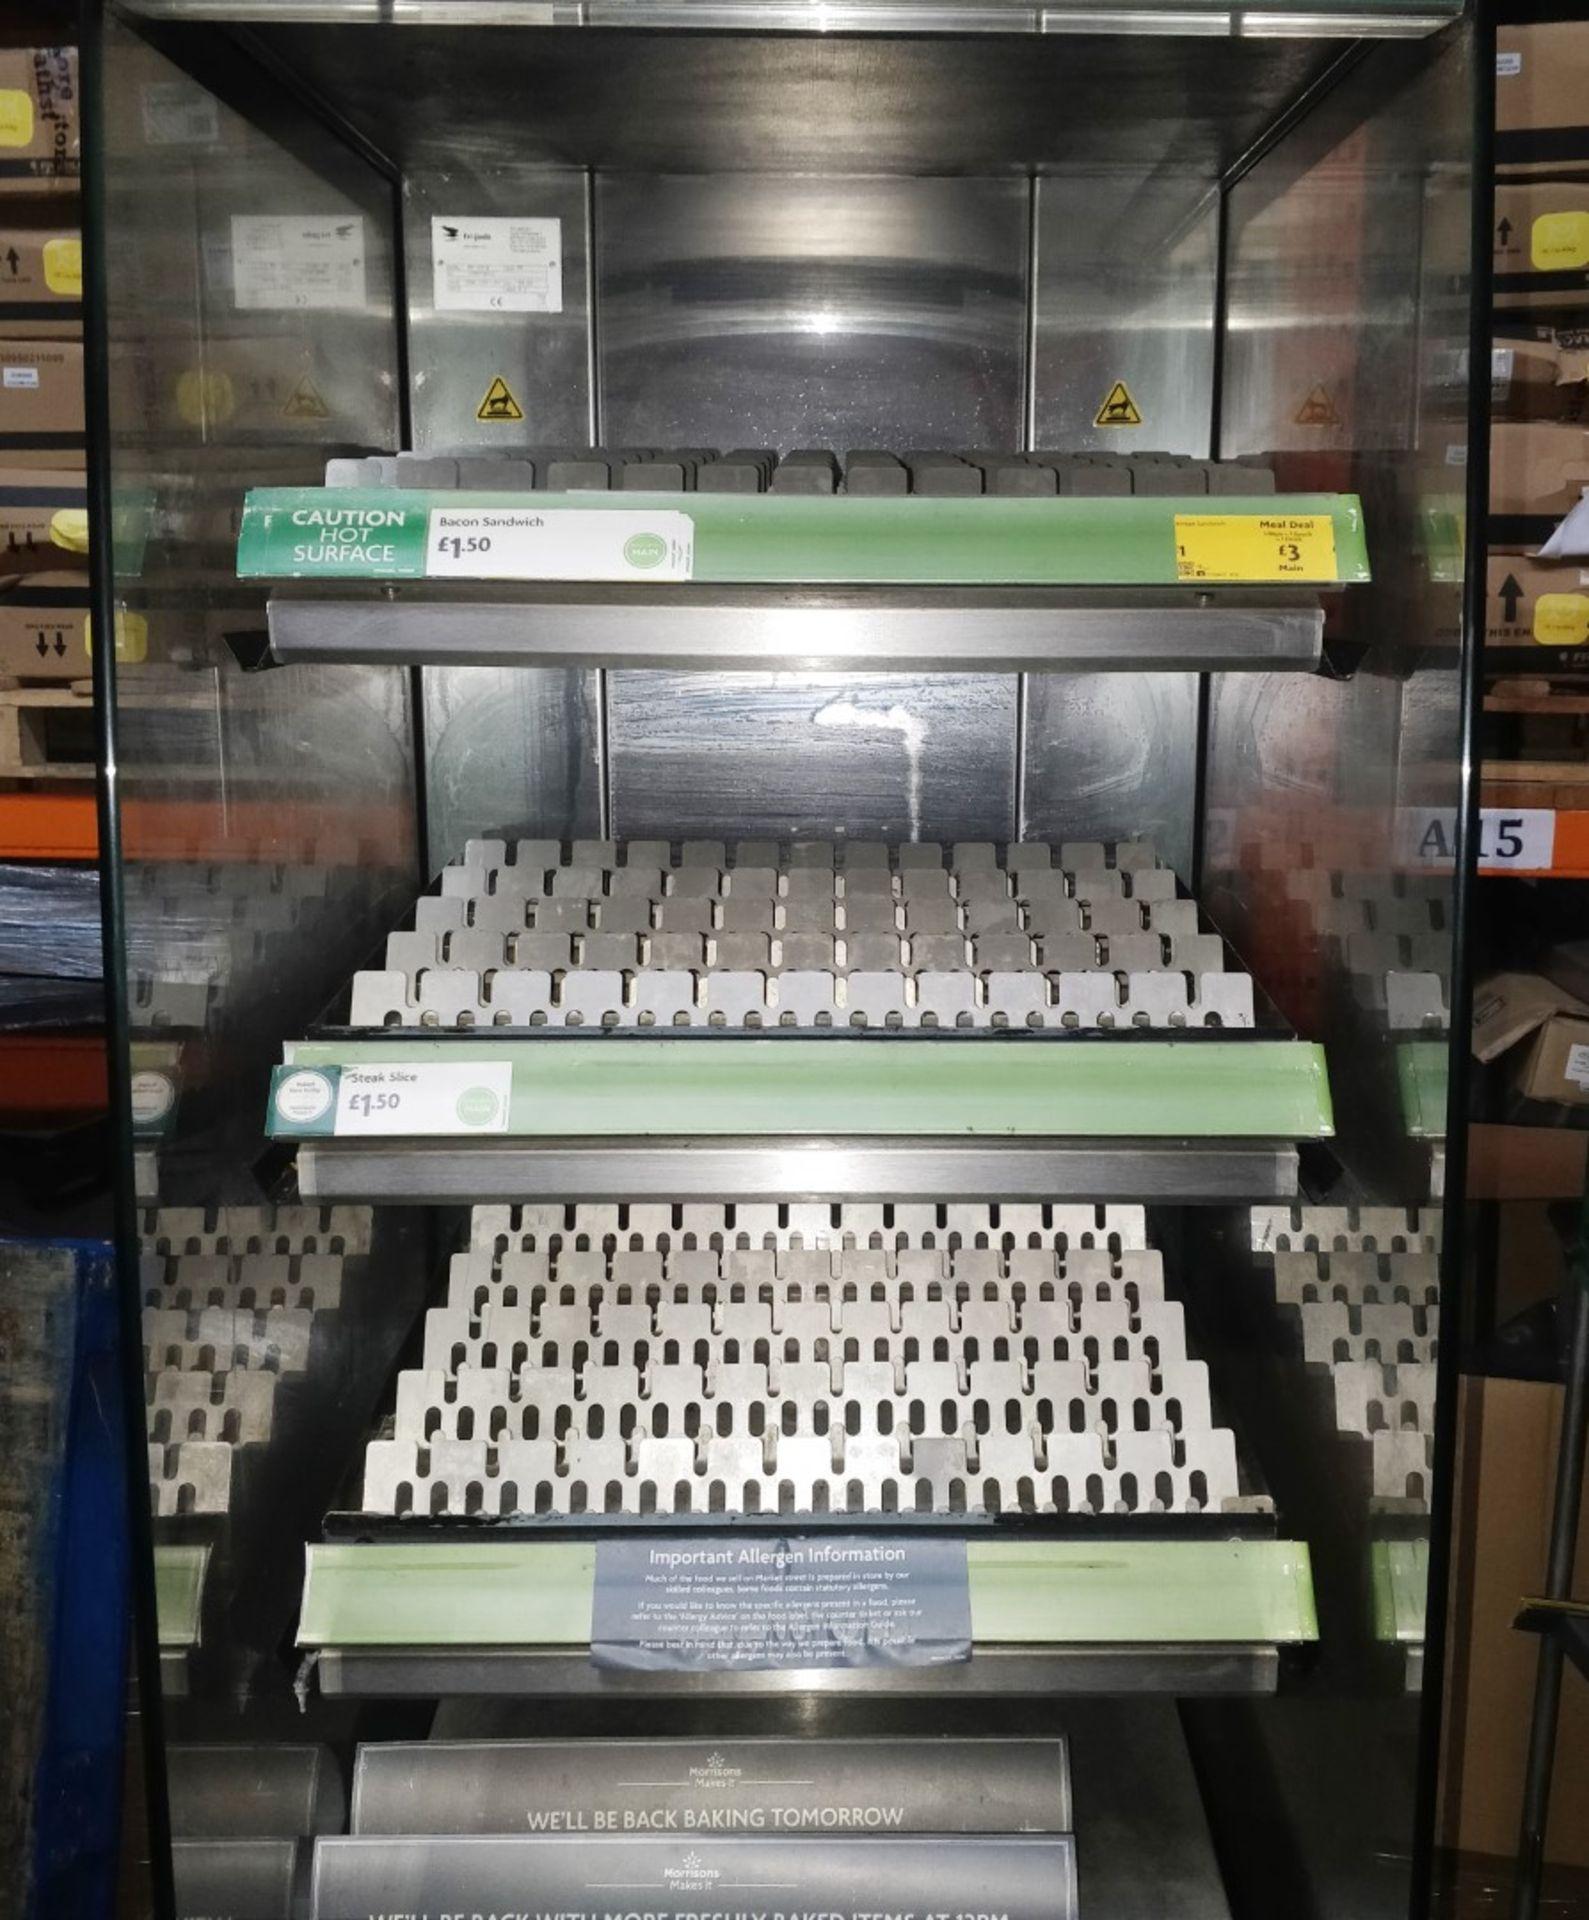 1 x Frijado Multi Deck 60 5 Level Heated Grab and Go Display Warmer - 400v 3 Phase - H197 x W60 x - Image 2 of 11